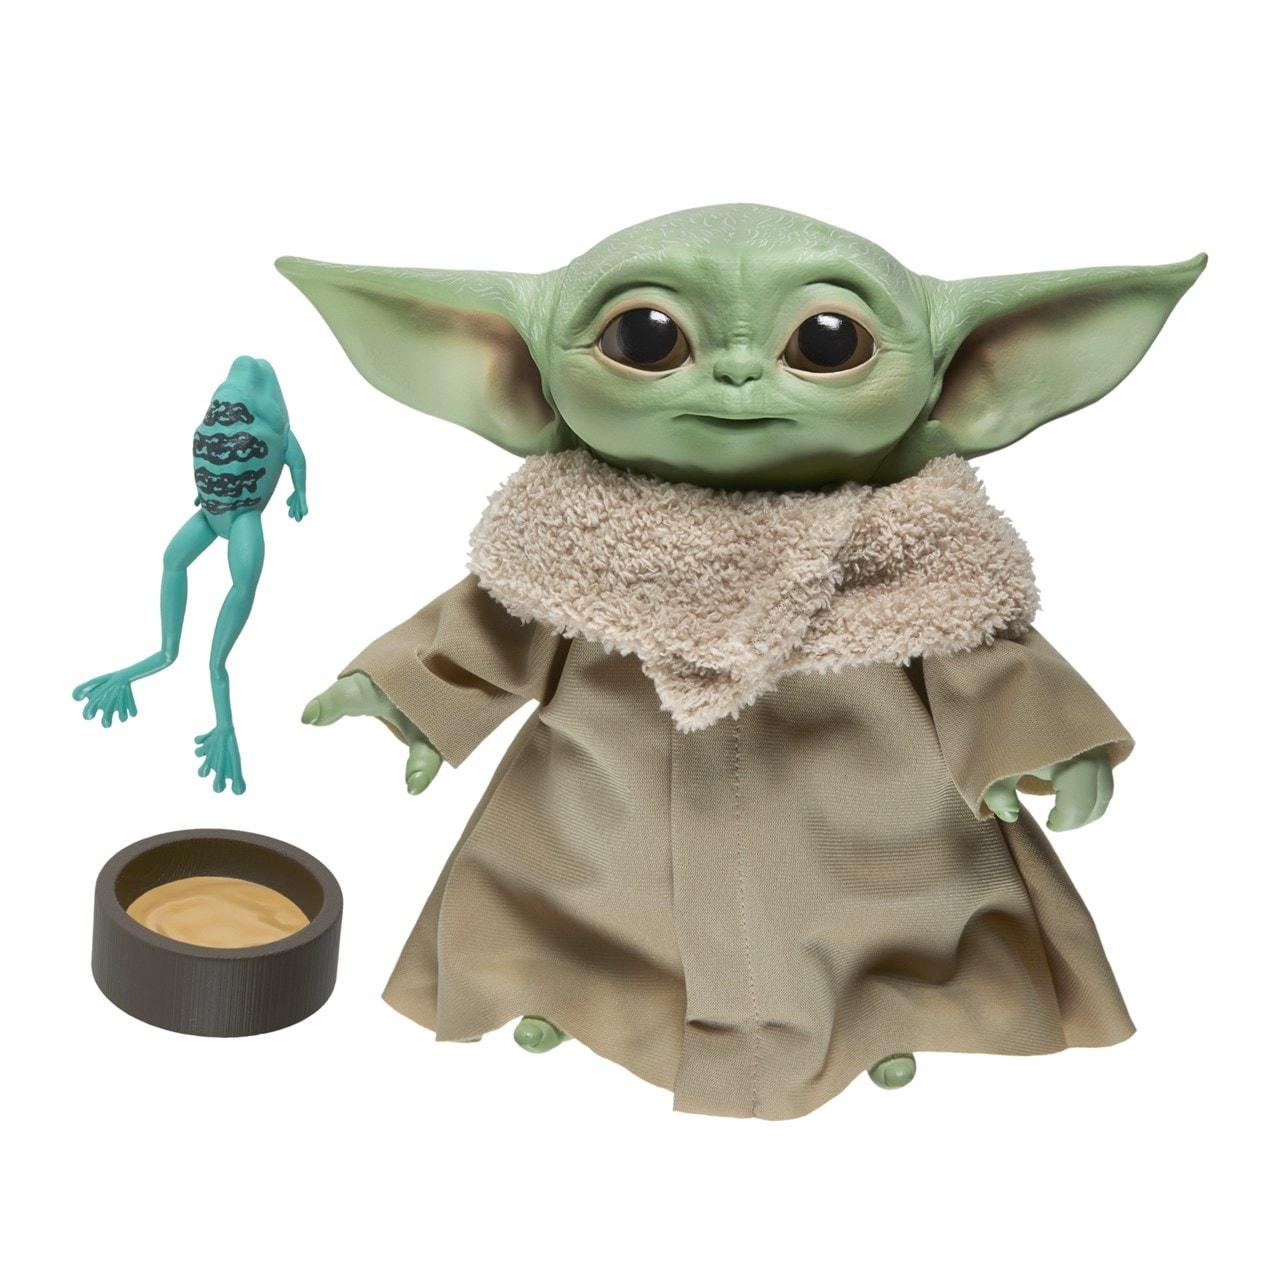 Star Wars: The Child (Baby Yoda) Talking Plush Toy - 1